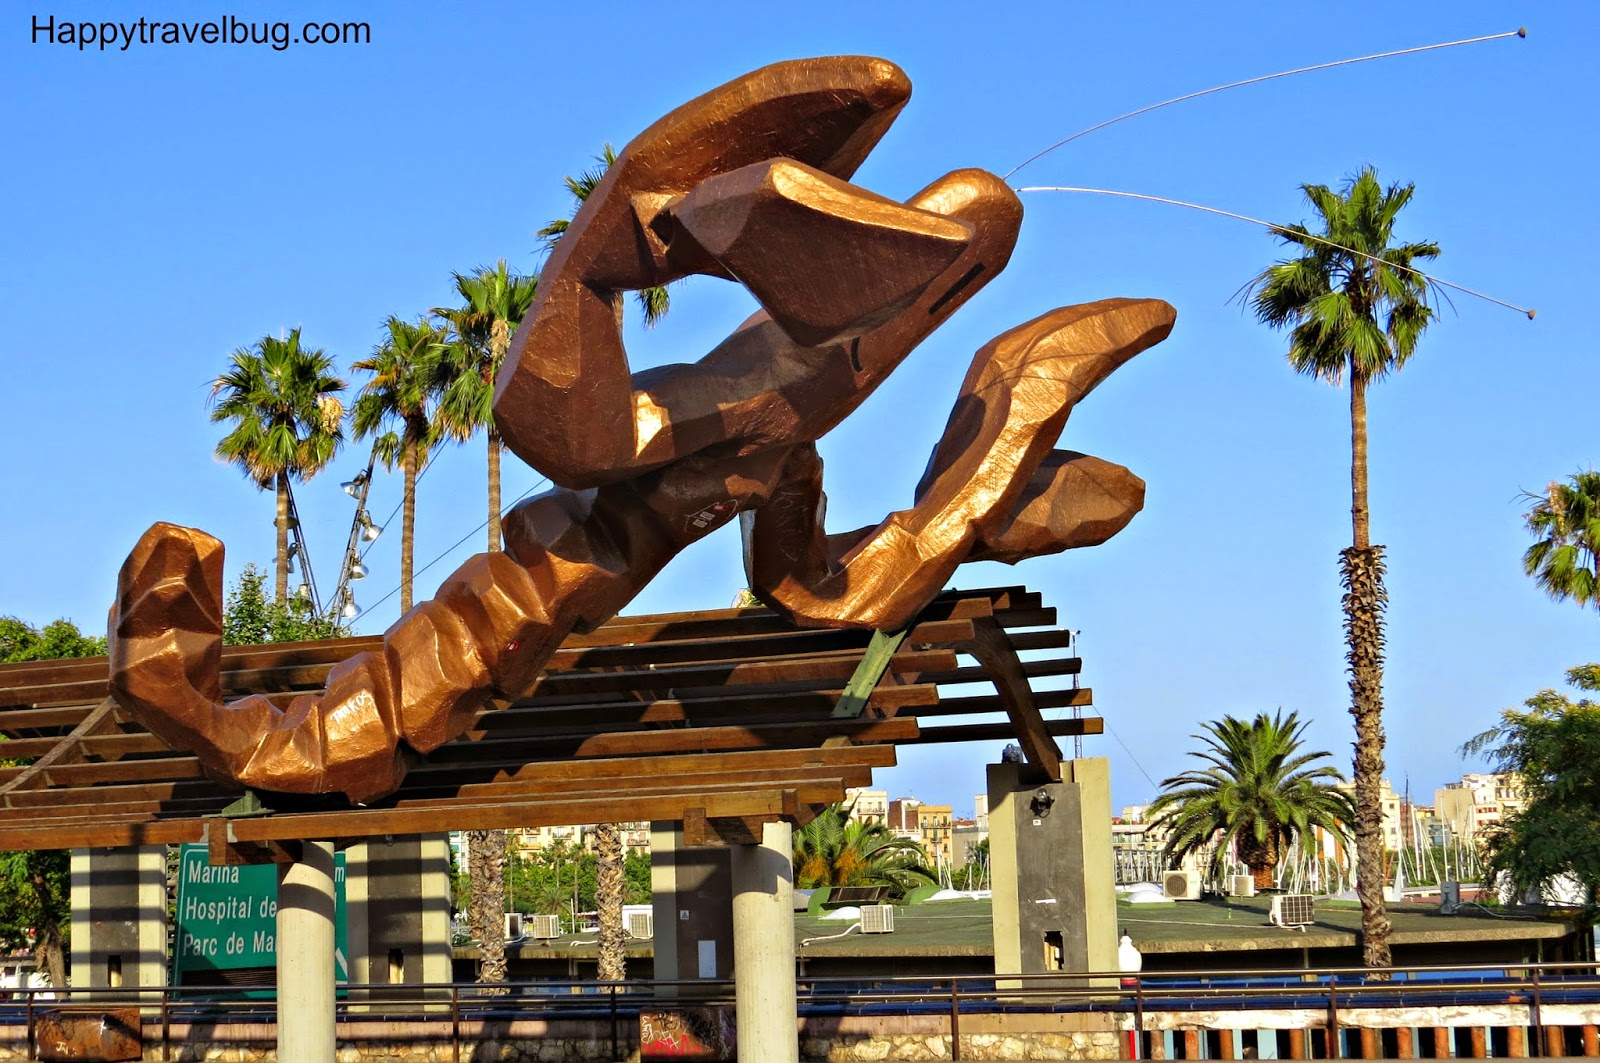 La Gamba by Javier Mariscal: Sculpture in Barcelona, Spain